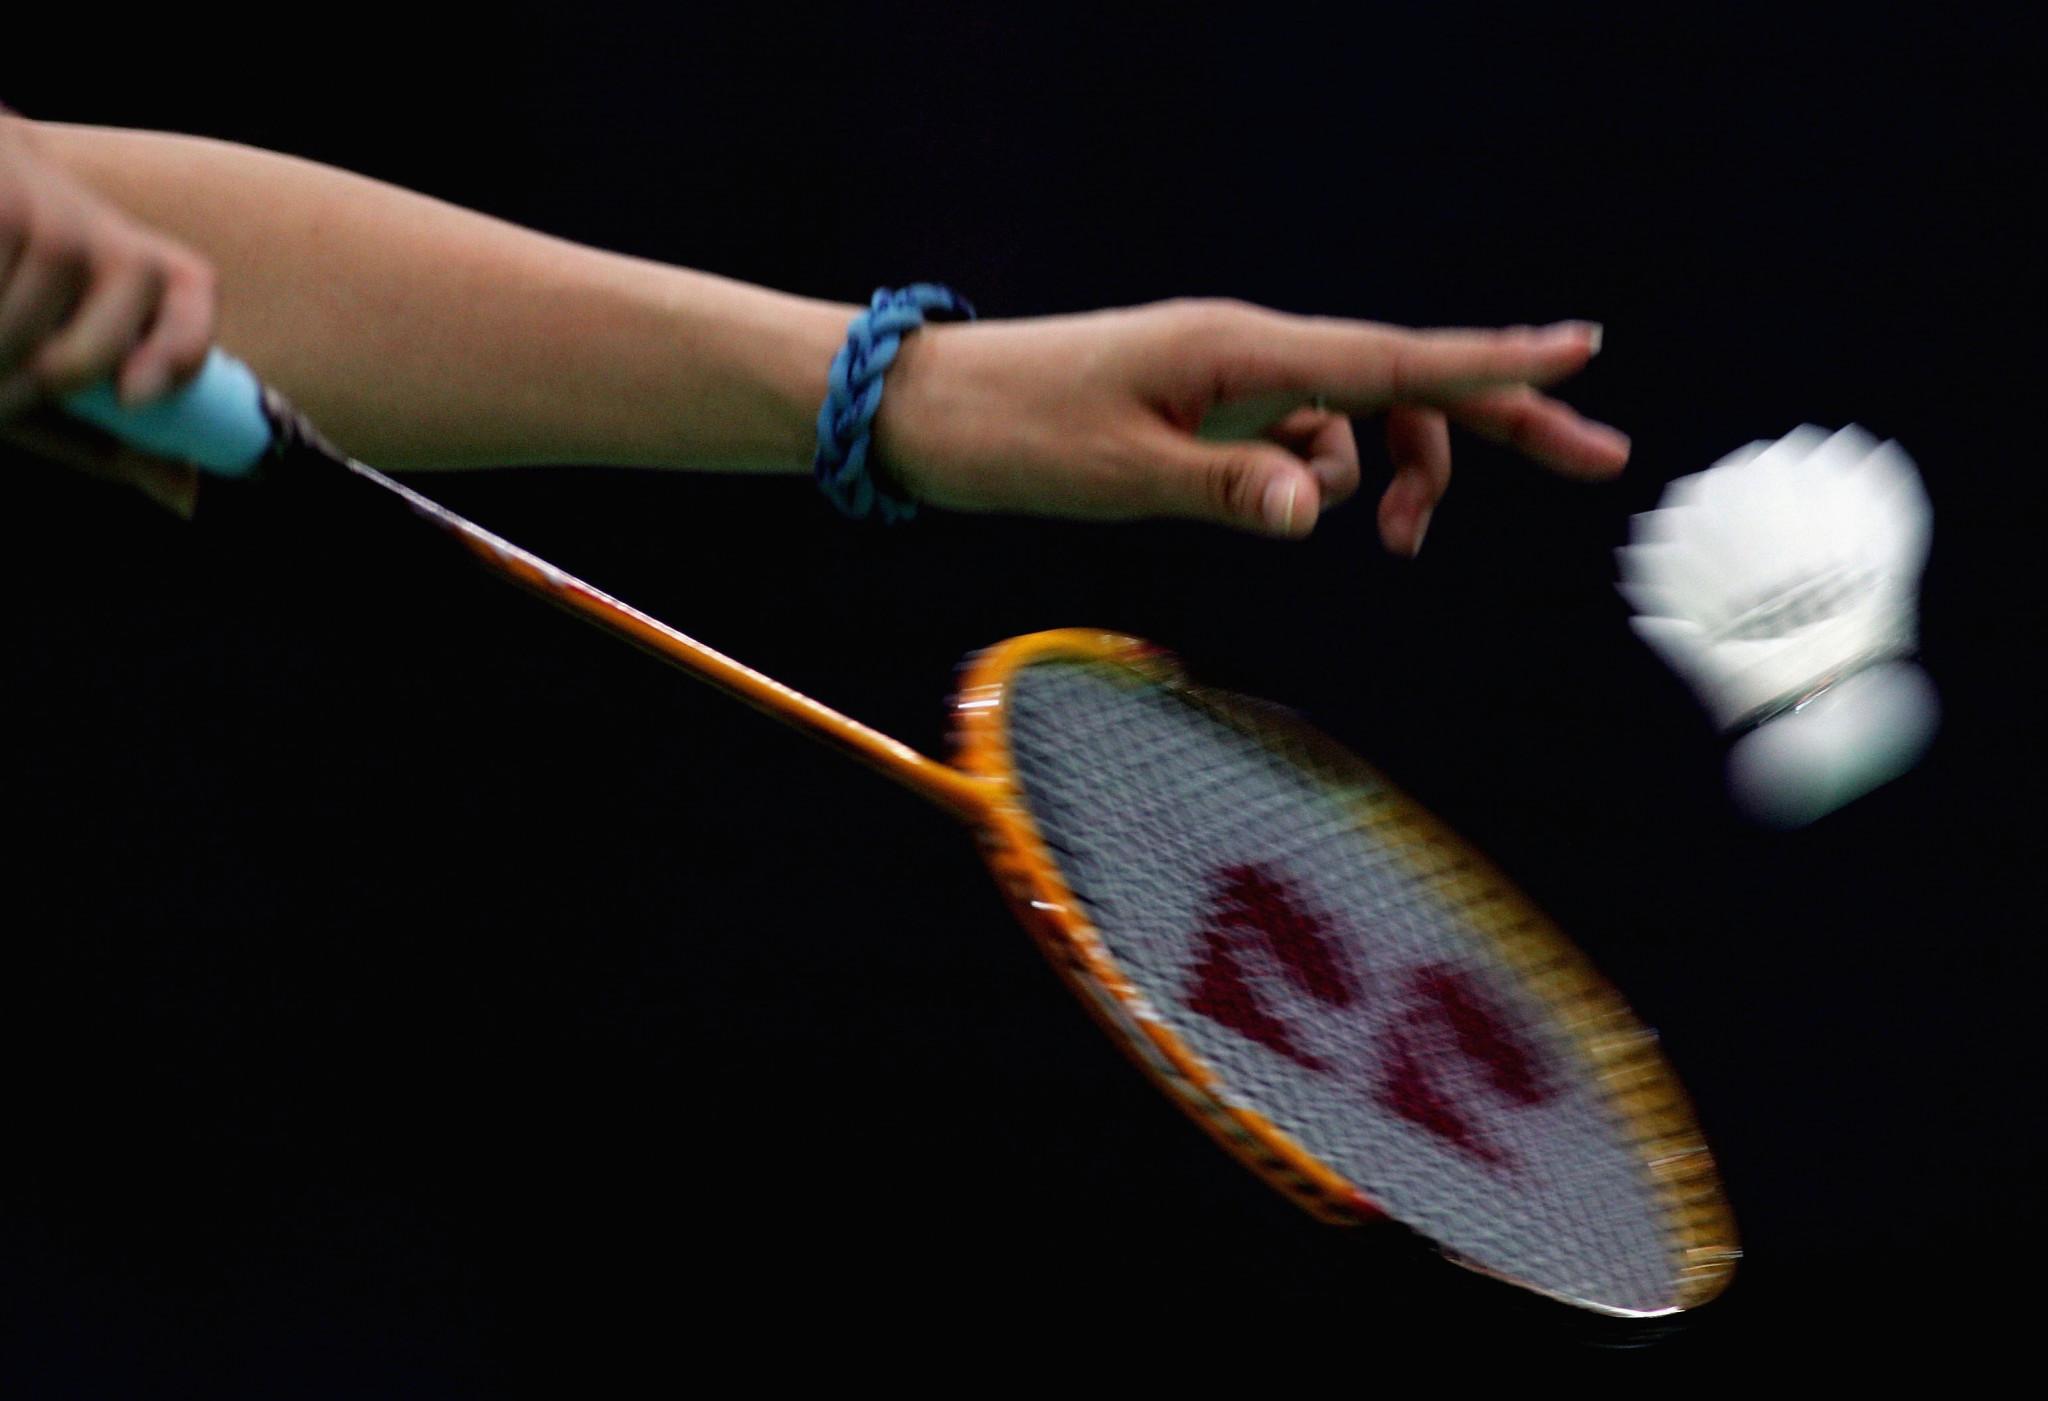 EOC adds badminton to 2023 European Games programme